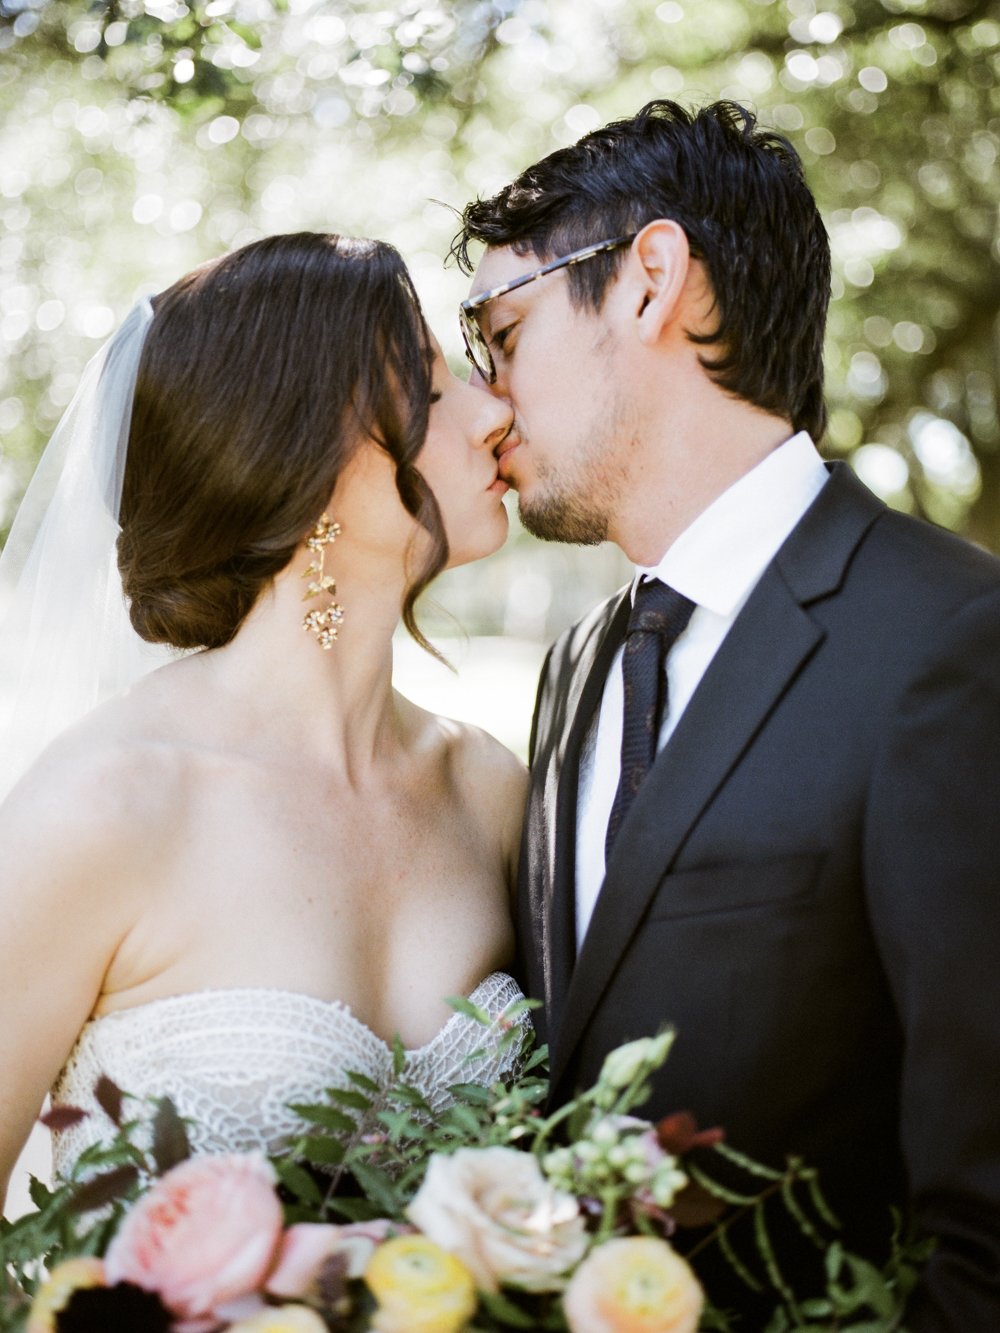 fall wedding at rothko chapel- houston wedding photographer-christine gosch - film photographer - elopement photographer- intimate wedding - lovely bride wedding gown-6.jpg